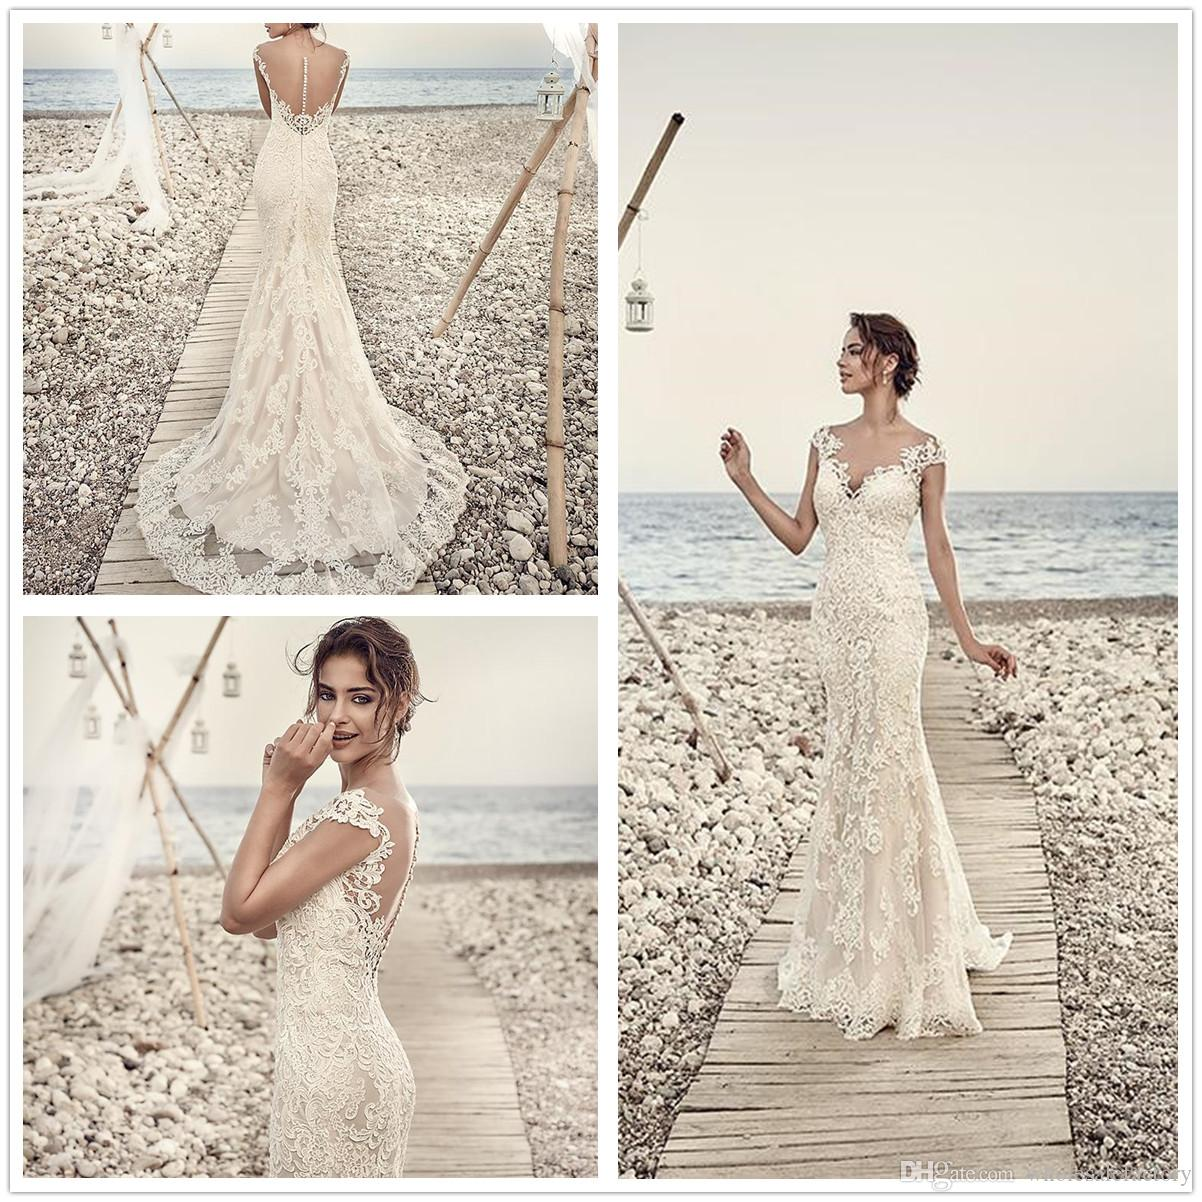 0dda3e397bd1 Elegant Lace Mermaid Wedding Dresses 2018 Sheer Cap Sleeves Tulle Applique  Long Bridal Wedding Gowns With Buttons Couture Mermaid Wedding Dresses  Halter ...